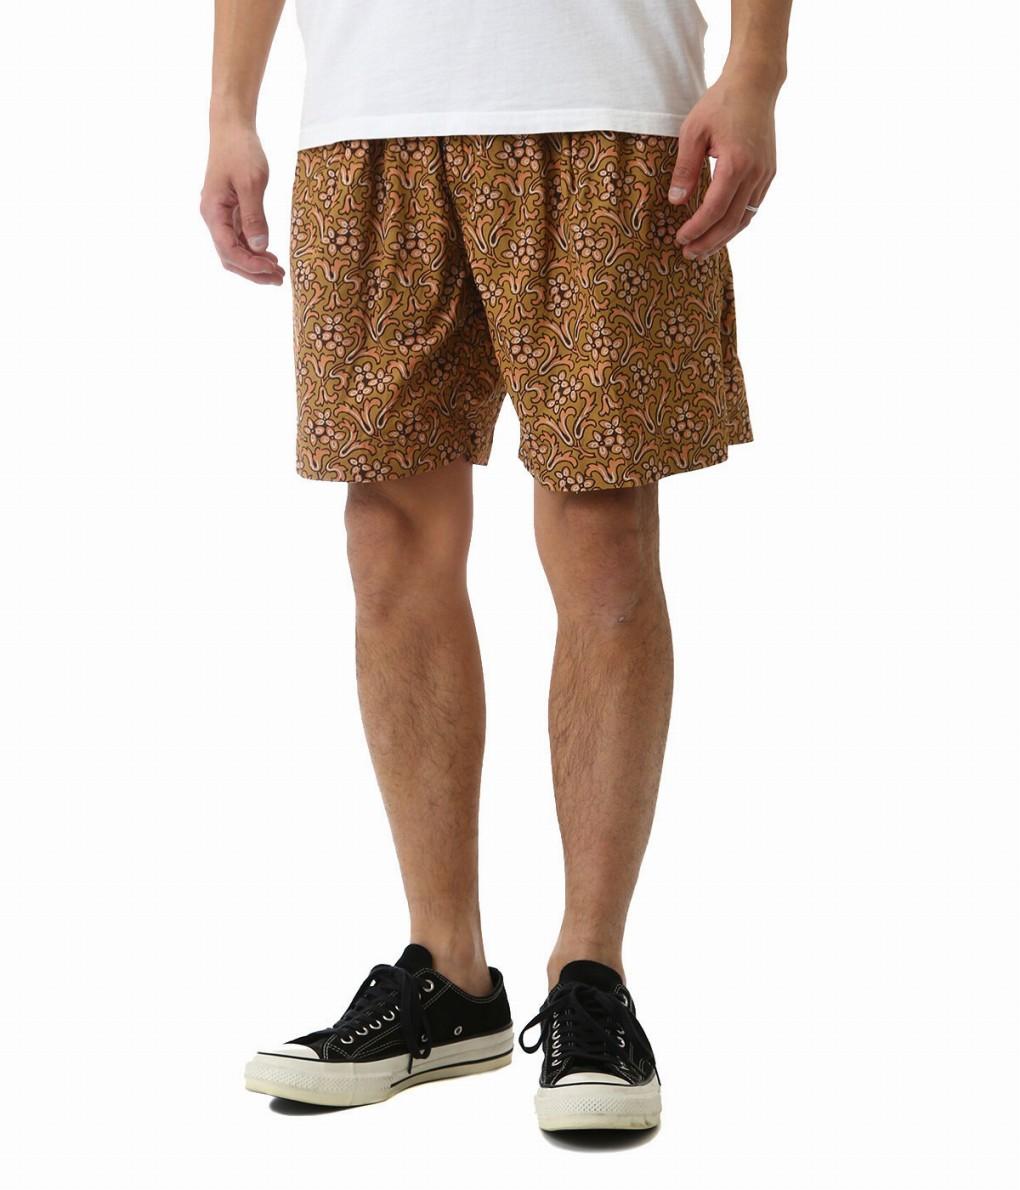 KAPTAIN SUNSHINE / キャプテンサンシャイン : Athletic Wide Shorts : ワイド ショーツ メンズ : KS9SPT15 【NOA】